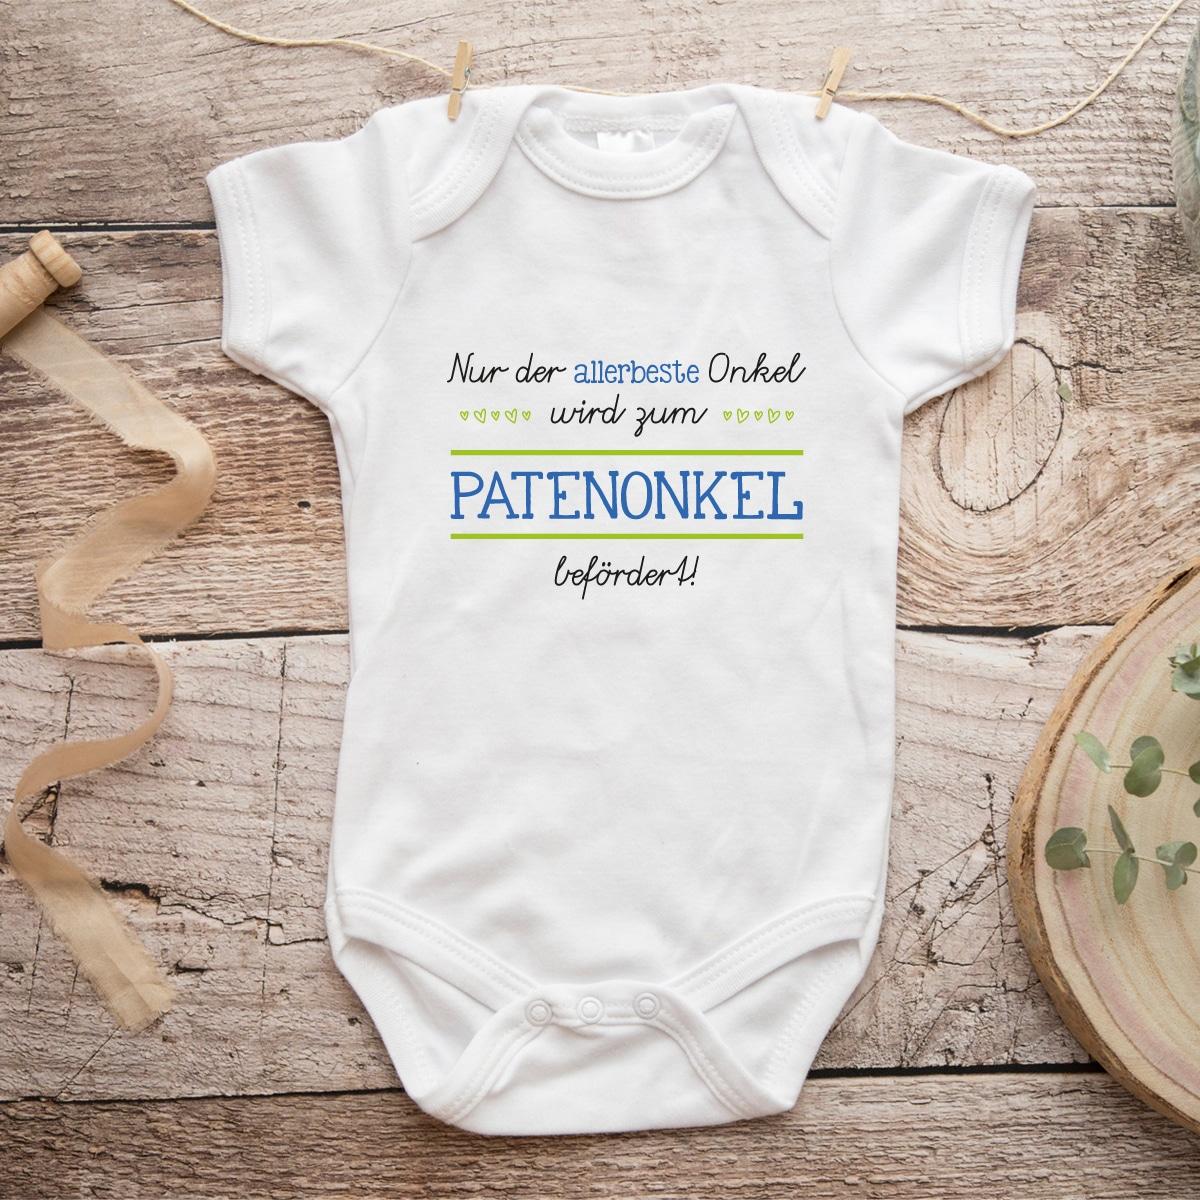 Patentante Patenonkel Taufe Strampler Babybody Baby Body Pateneltern werden